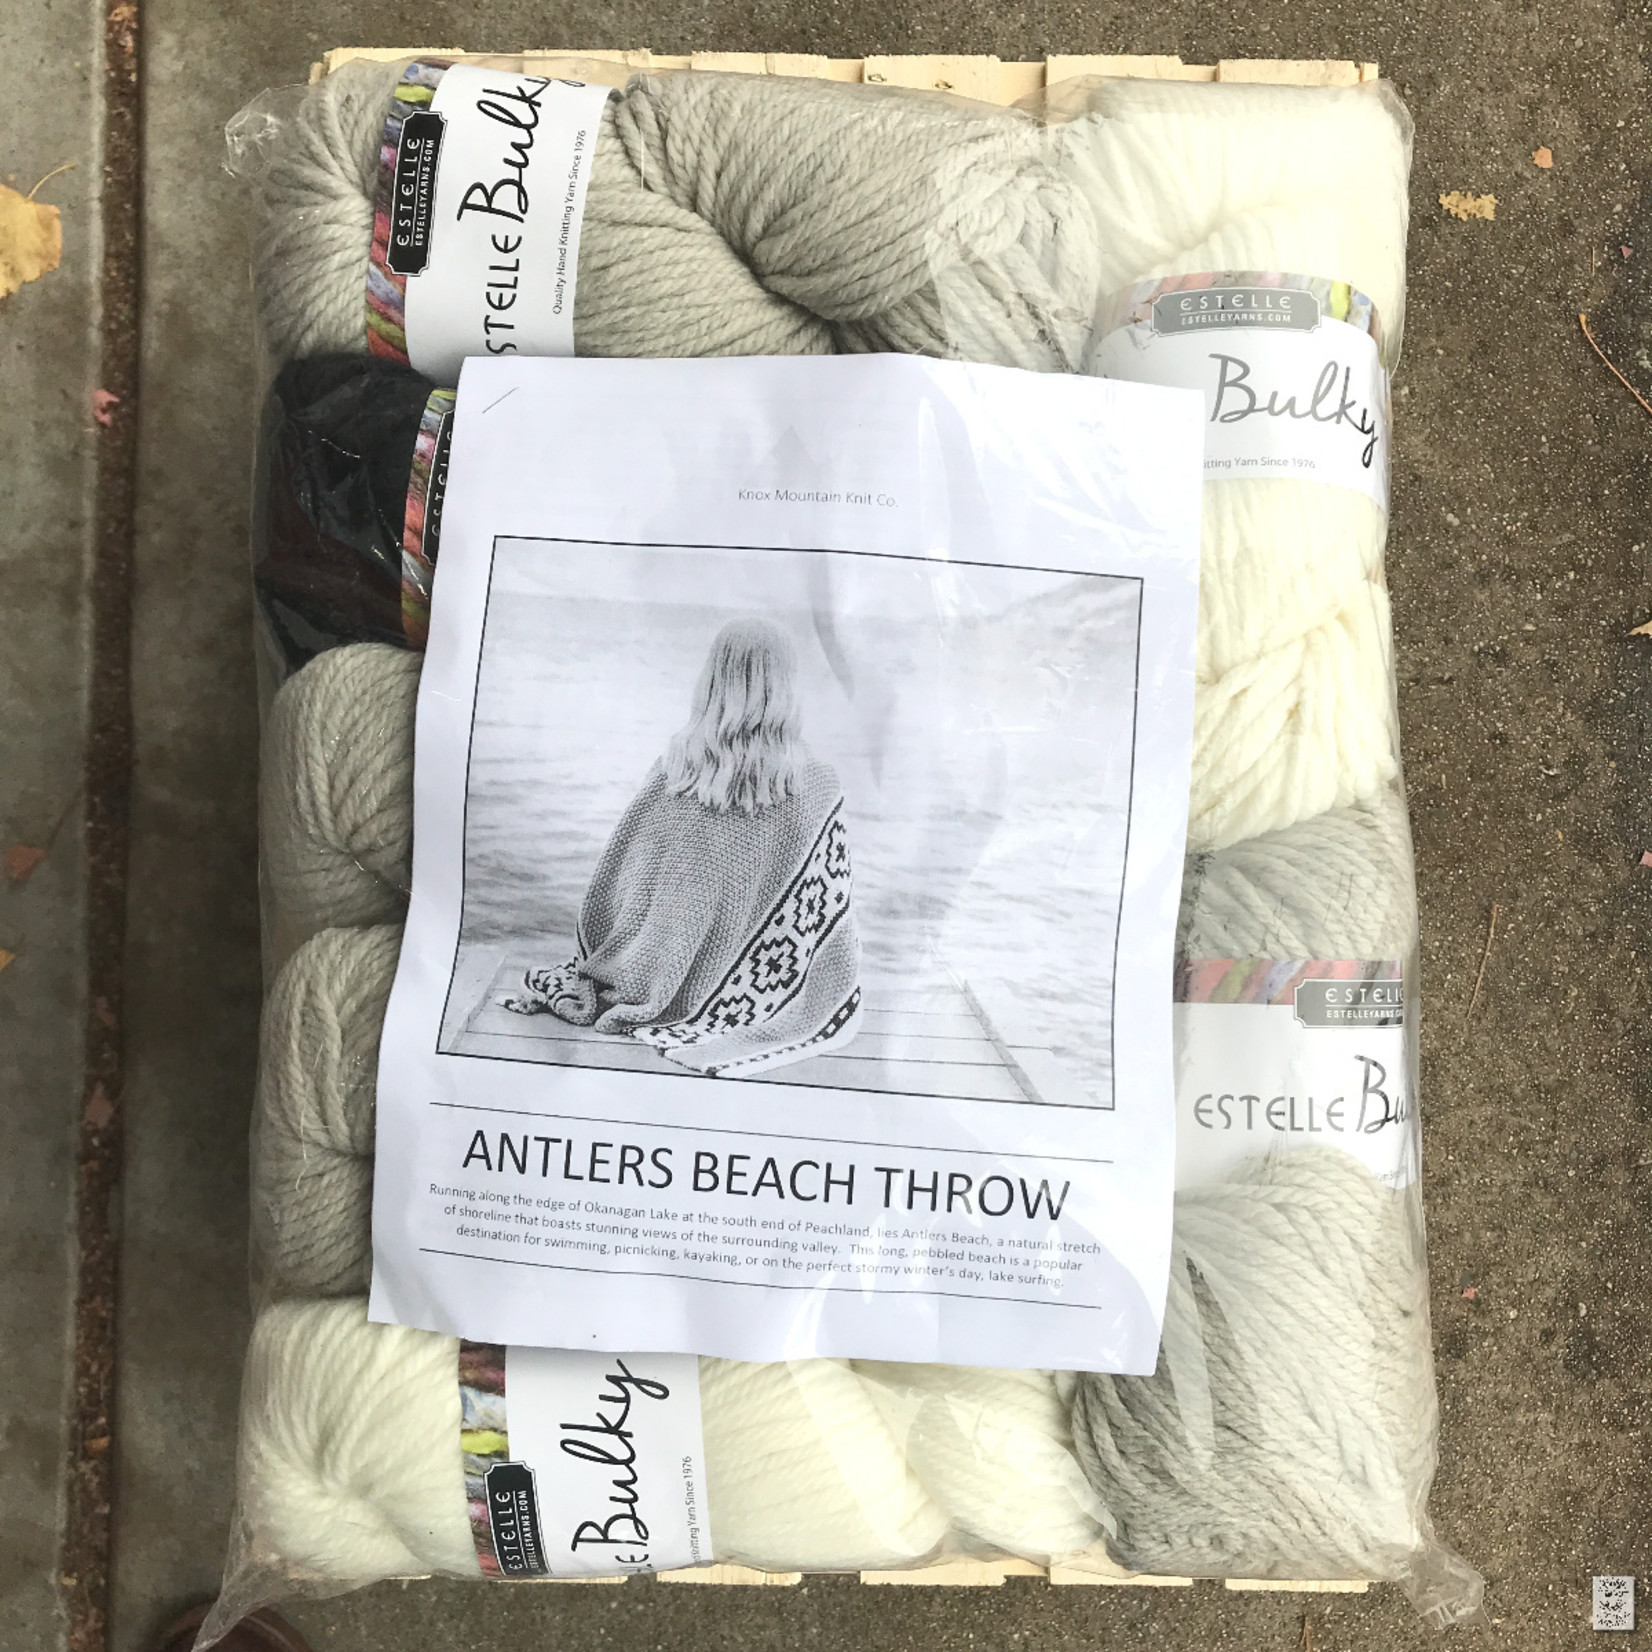 Antlers Beach Throw Kit